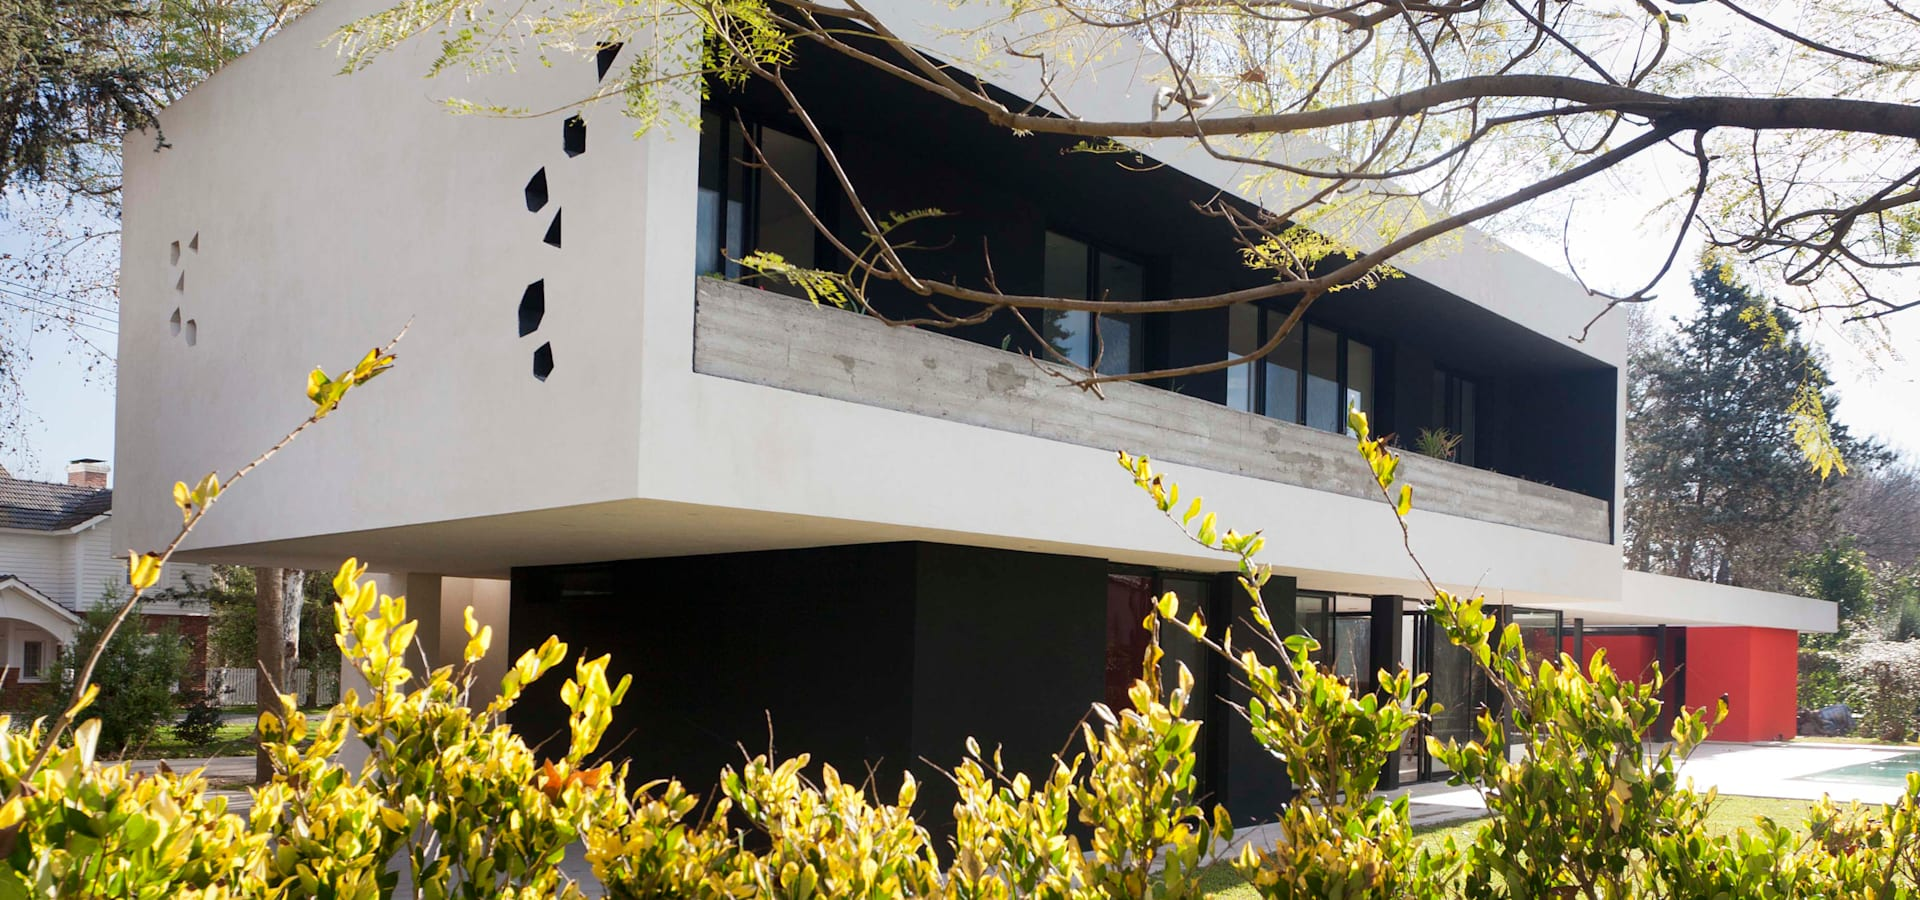 Enrique Barberis Arquitecto